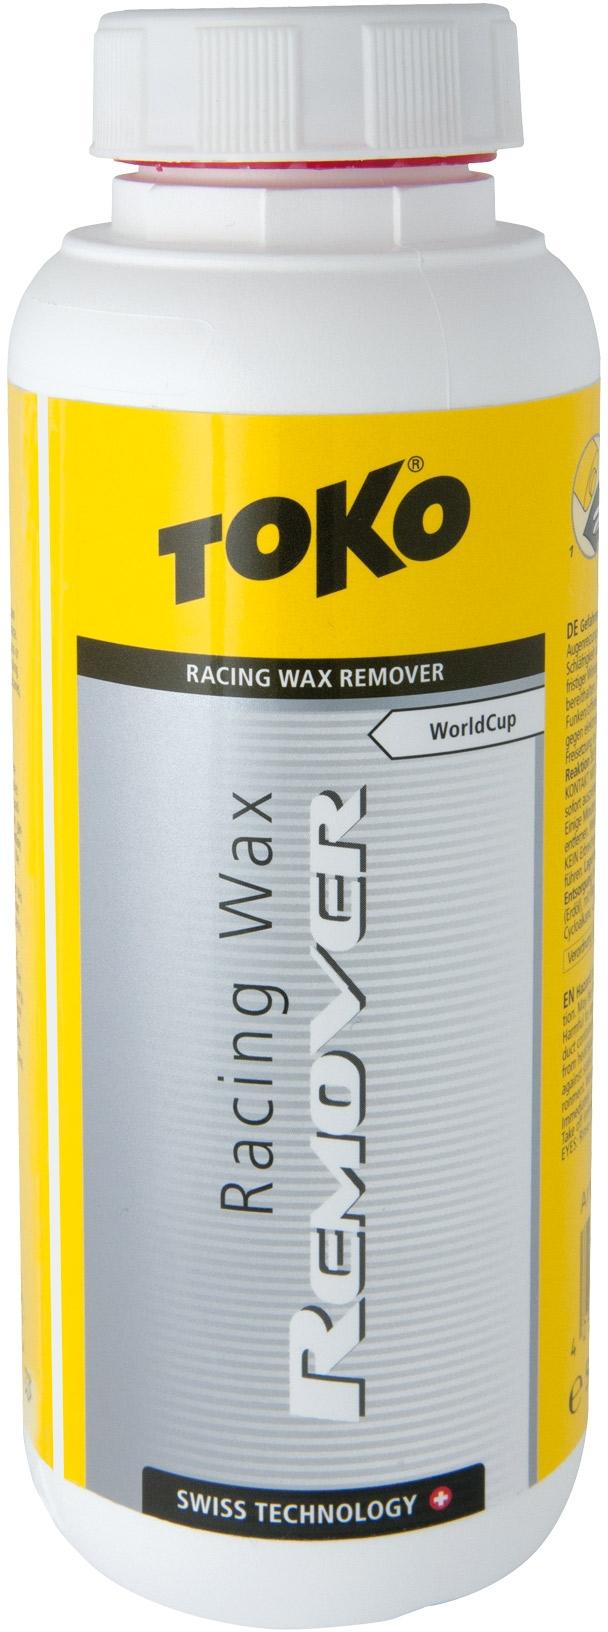 Toko Racing Waxremover - 500ml 500ml